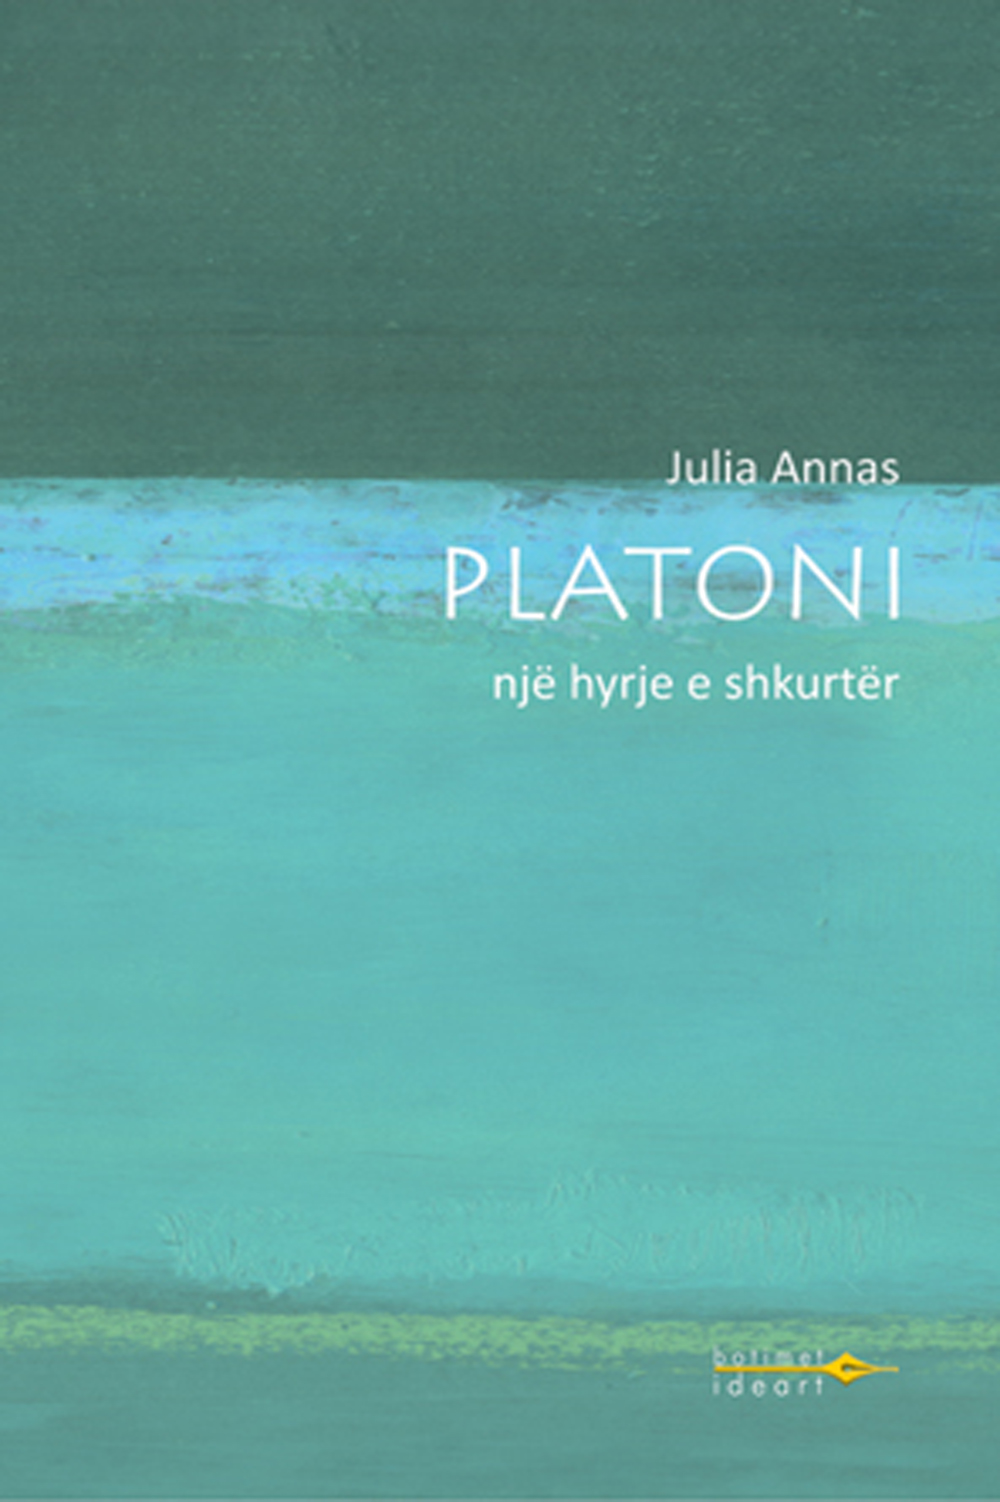 Platoni